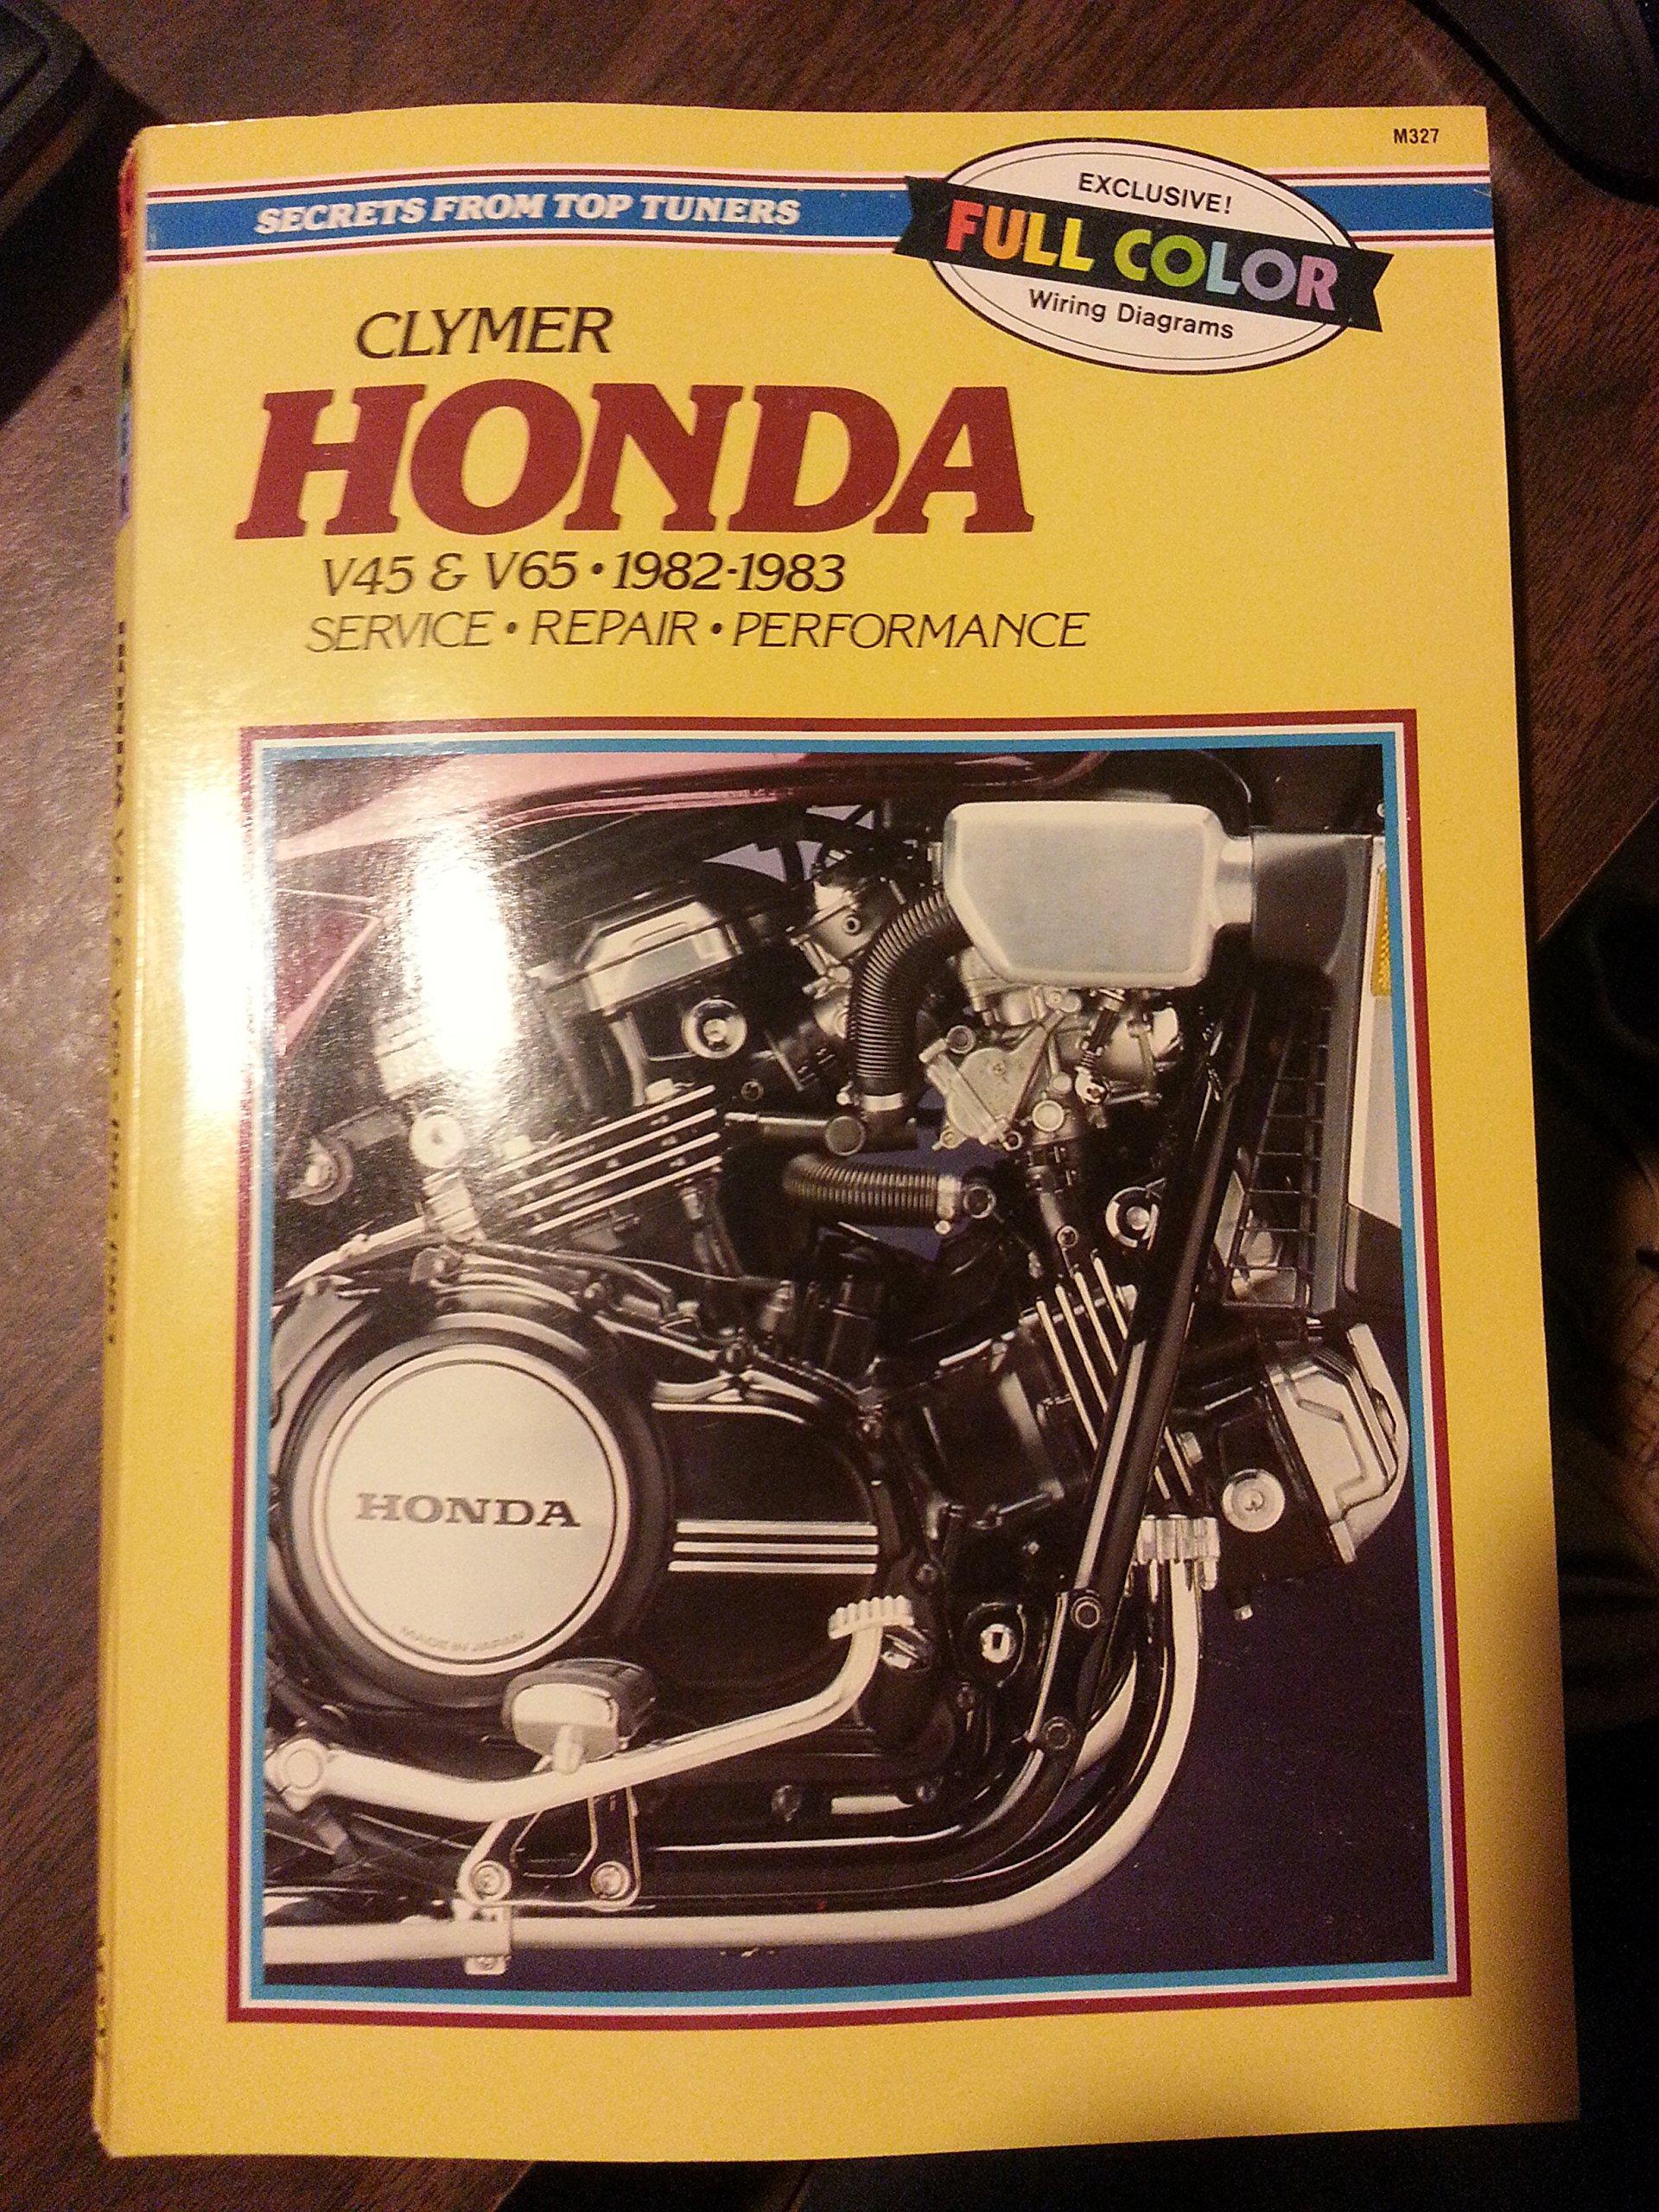 Honda: 700-1100cc V4 and V6, 1982-1987 (Service, Repair, Maintenance): Ed  Scott, Alan Ahlstrand, Sydnie A. Wauson: 9780892873845: Amazon.com: Books